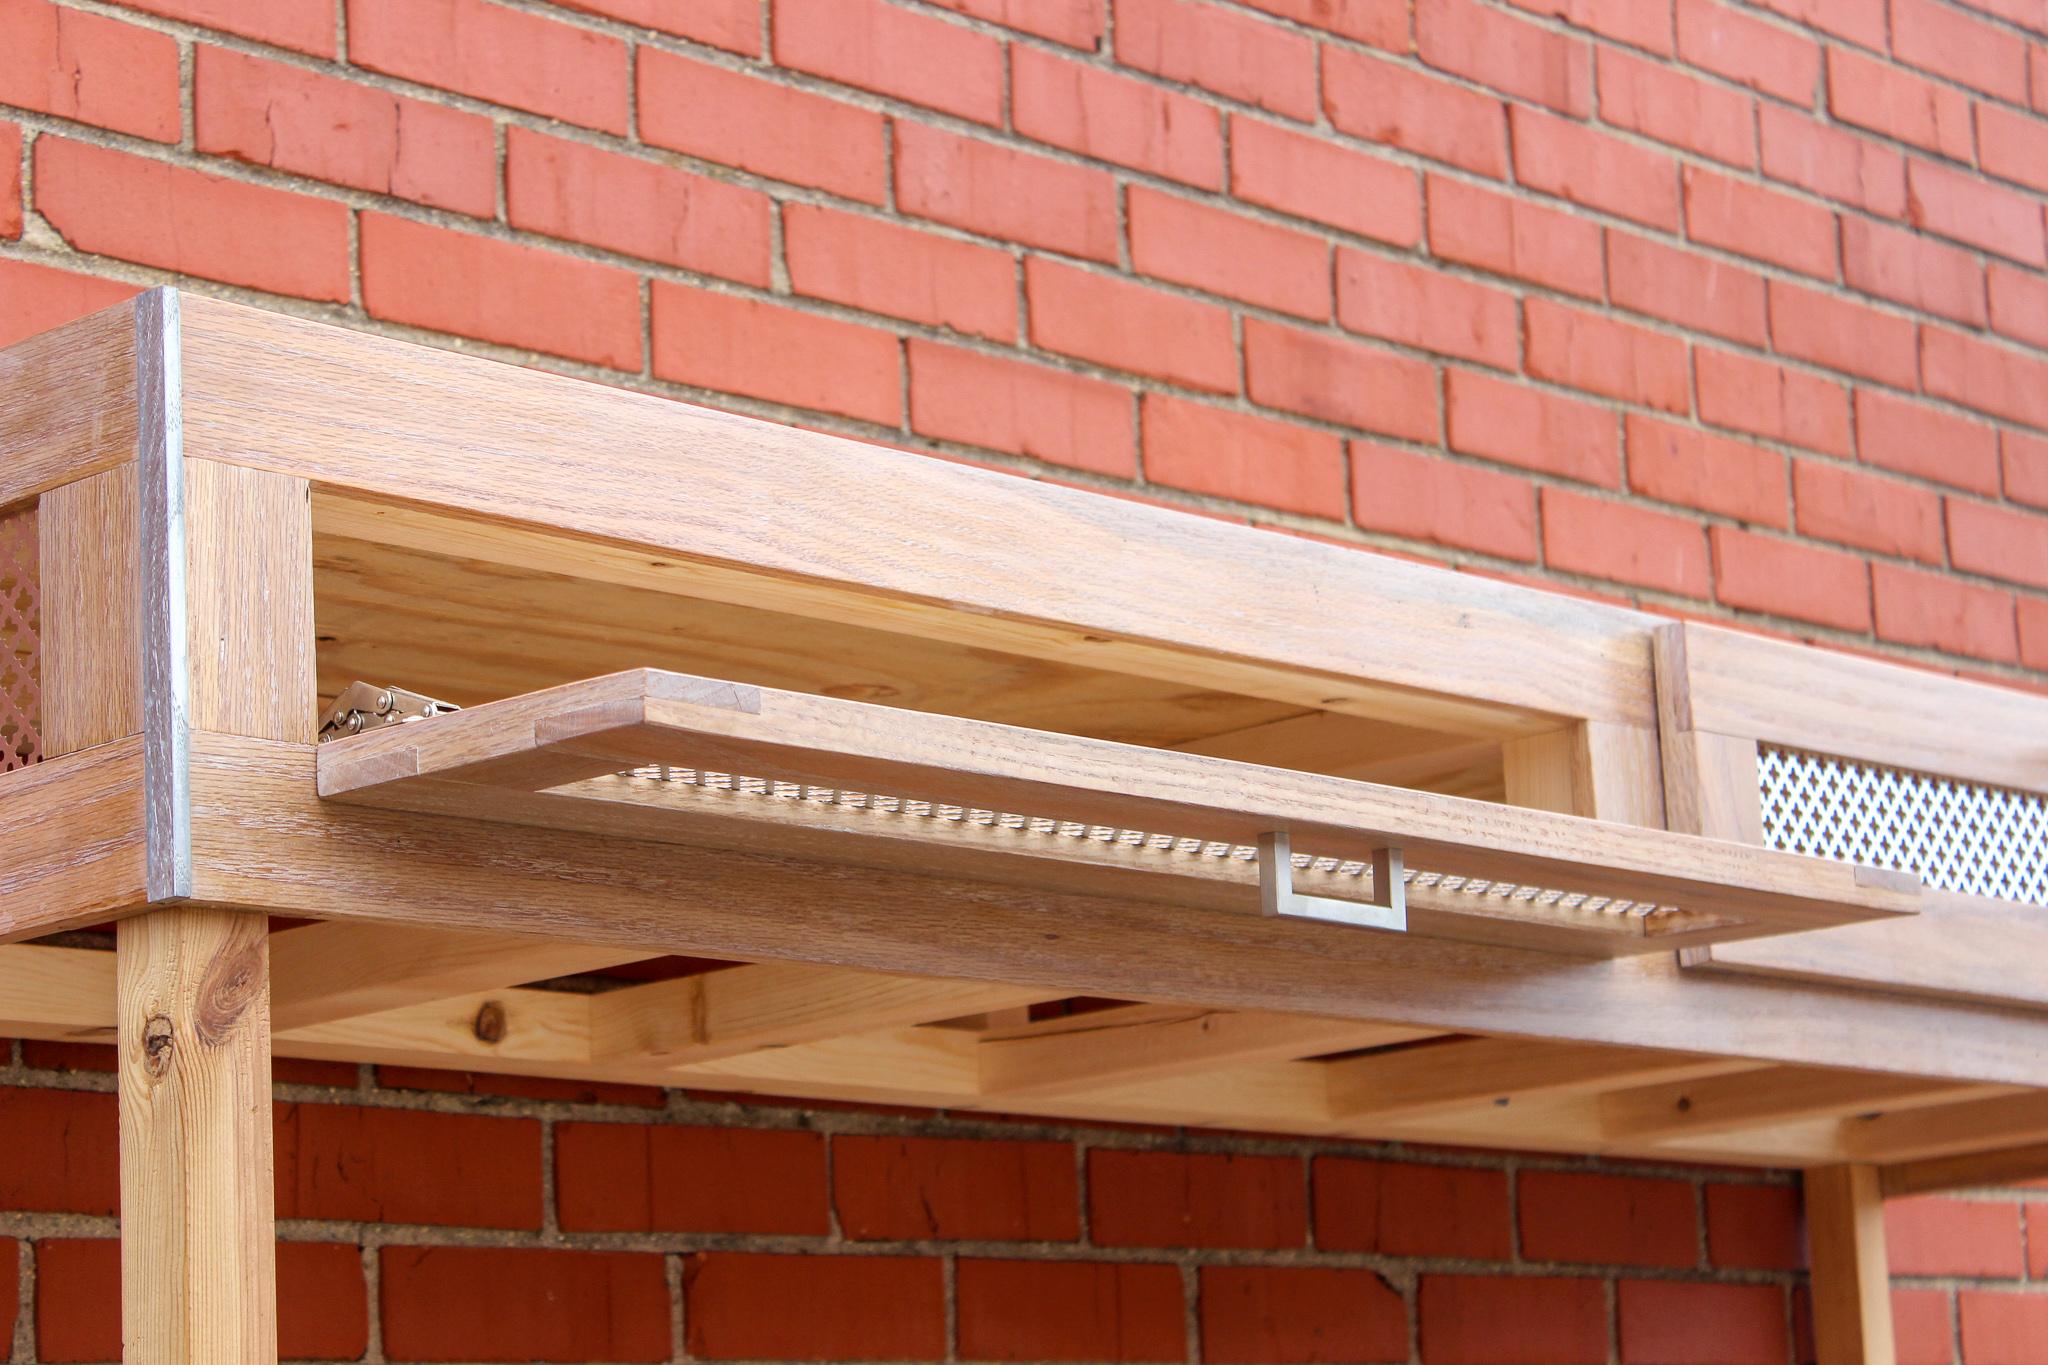 custom red oak aquarium stand mid century modern furniture Sallie Plumley Studio Richmond Virginia Sally Plumley Custom Woodworking and Furniture Design